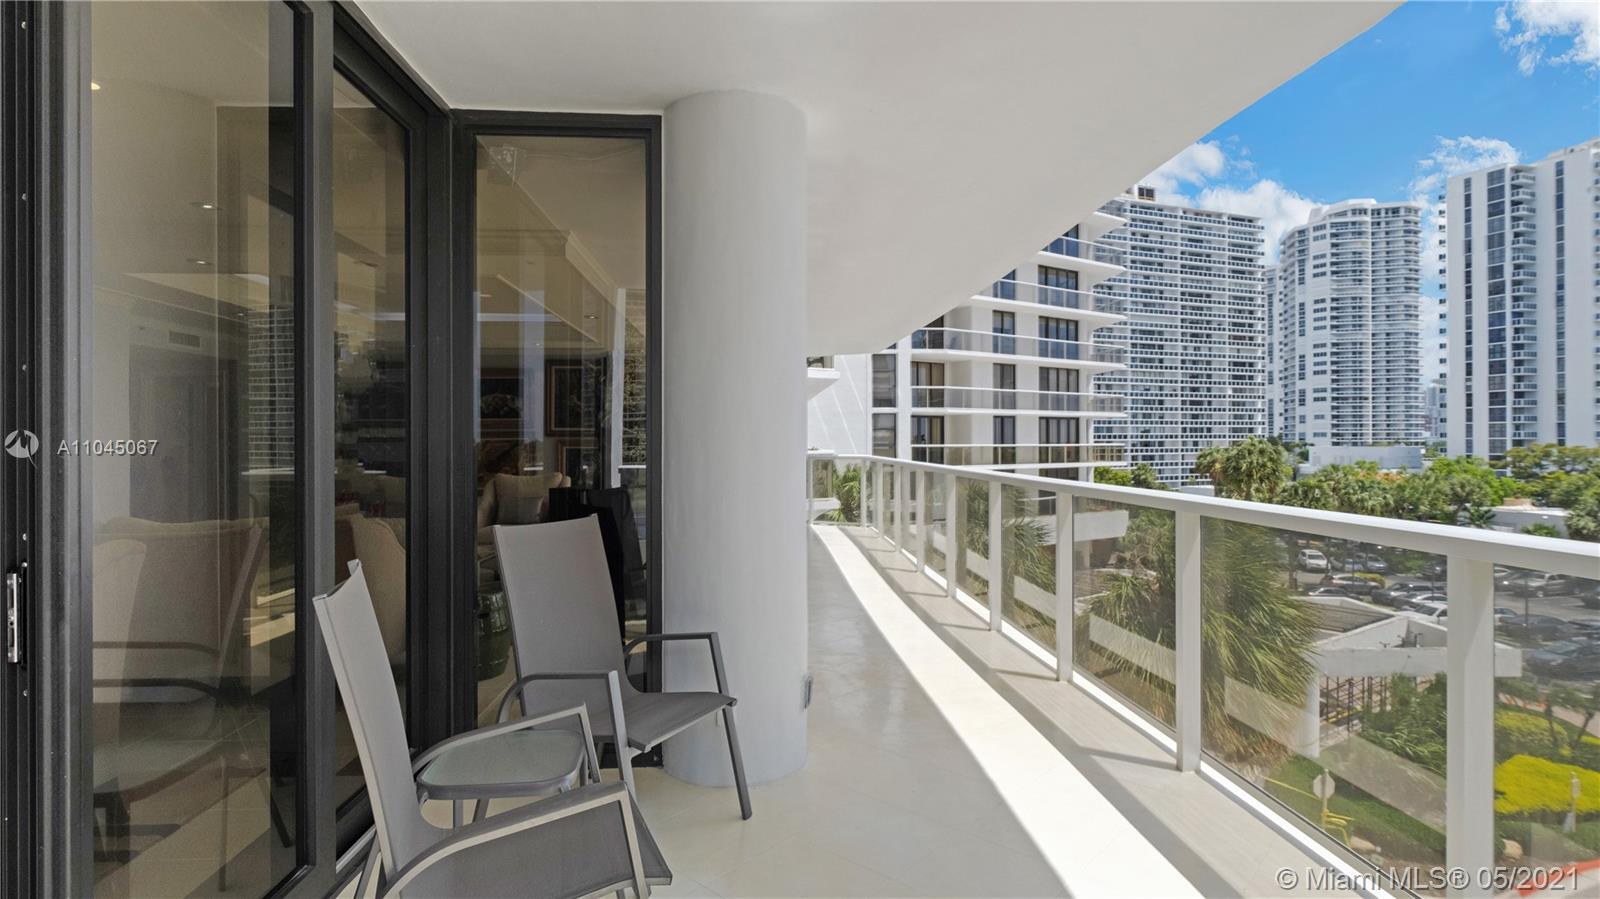 Photo of 20281 Country Club Dr #314, Aventura, Florida, 33180 - Condominiums along Country Club Dr, Aventura